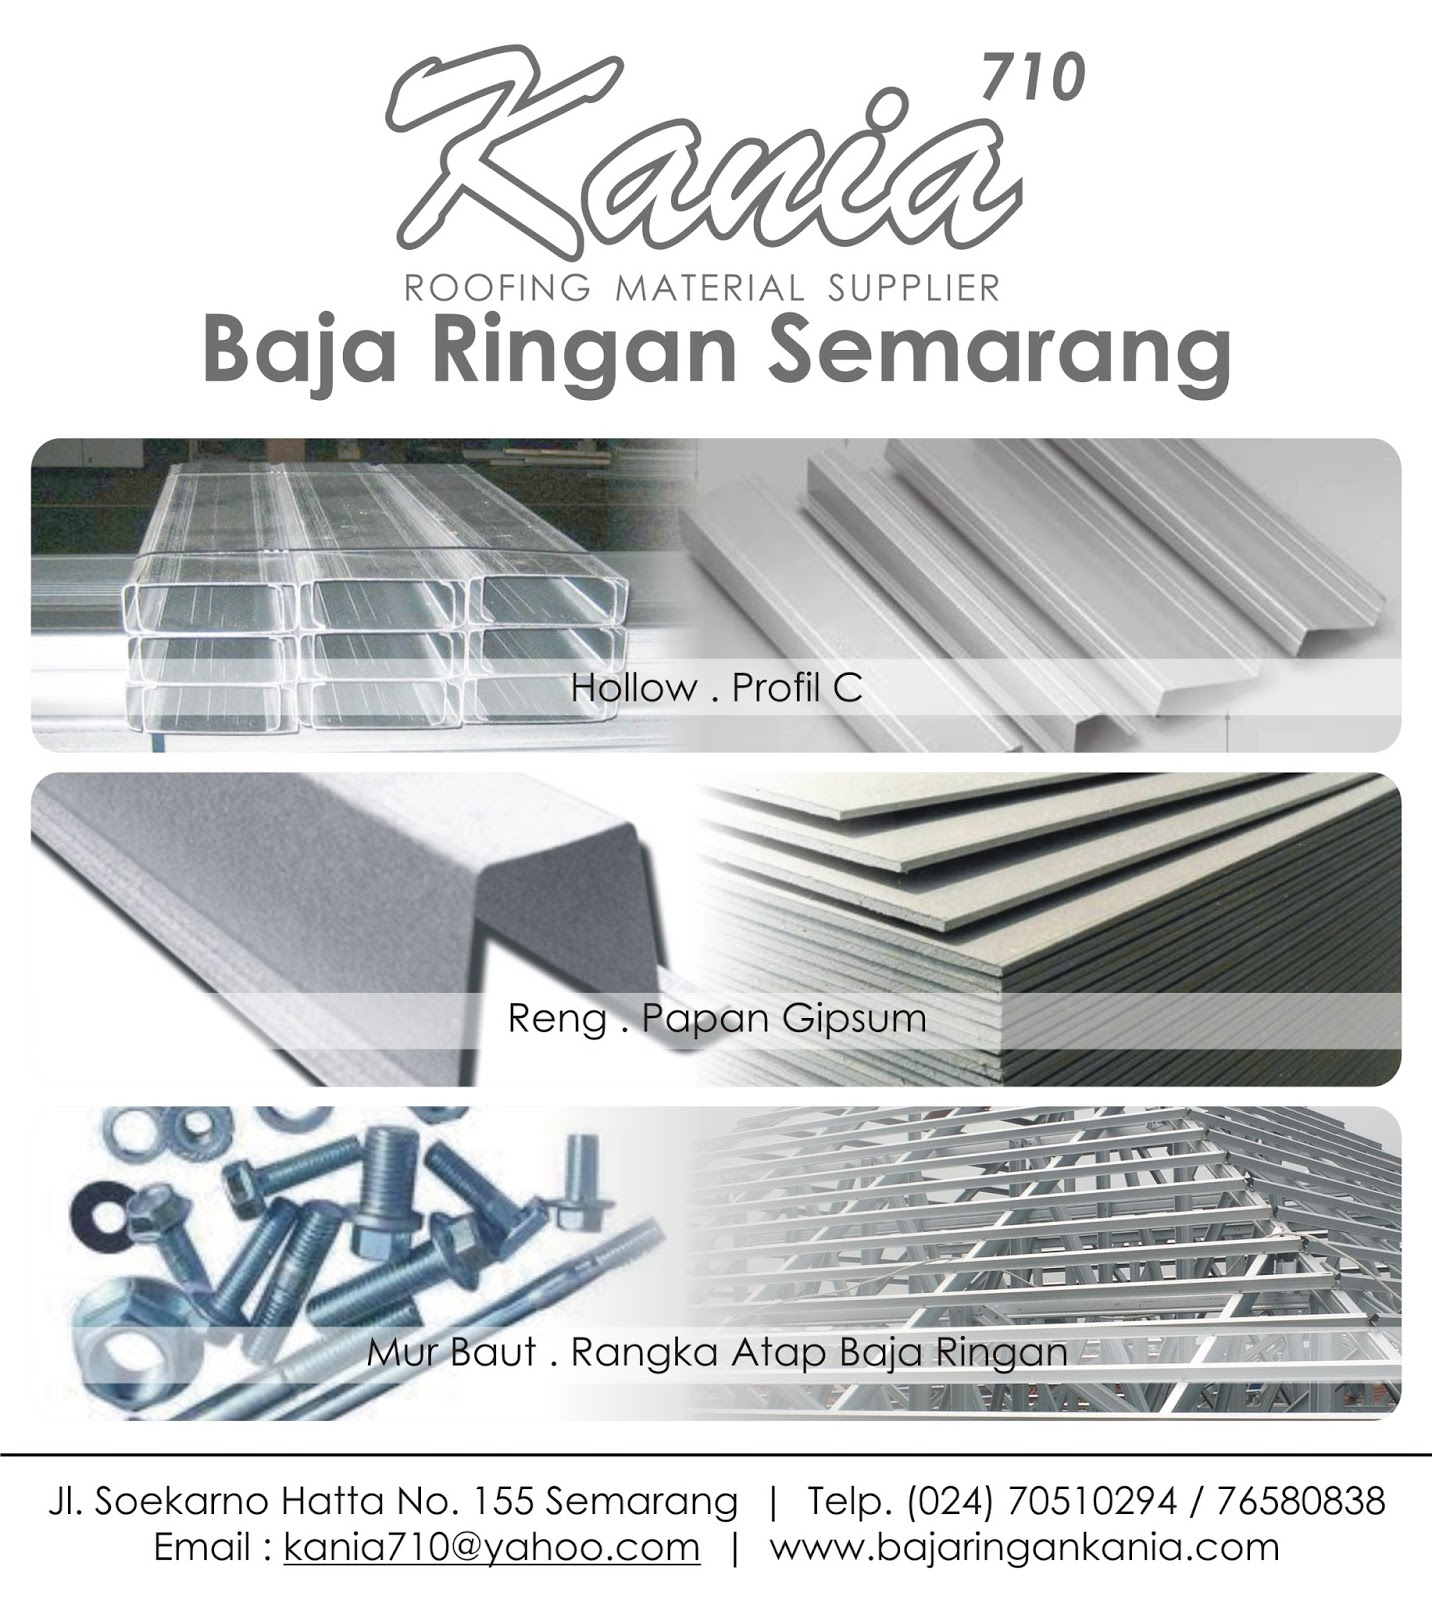 Supplier Baja Ringan Di Semarang Berkualitas Purwodadi Info Harga Atap Galvalum Kania